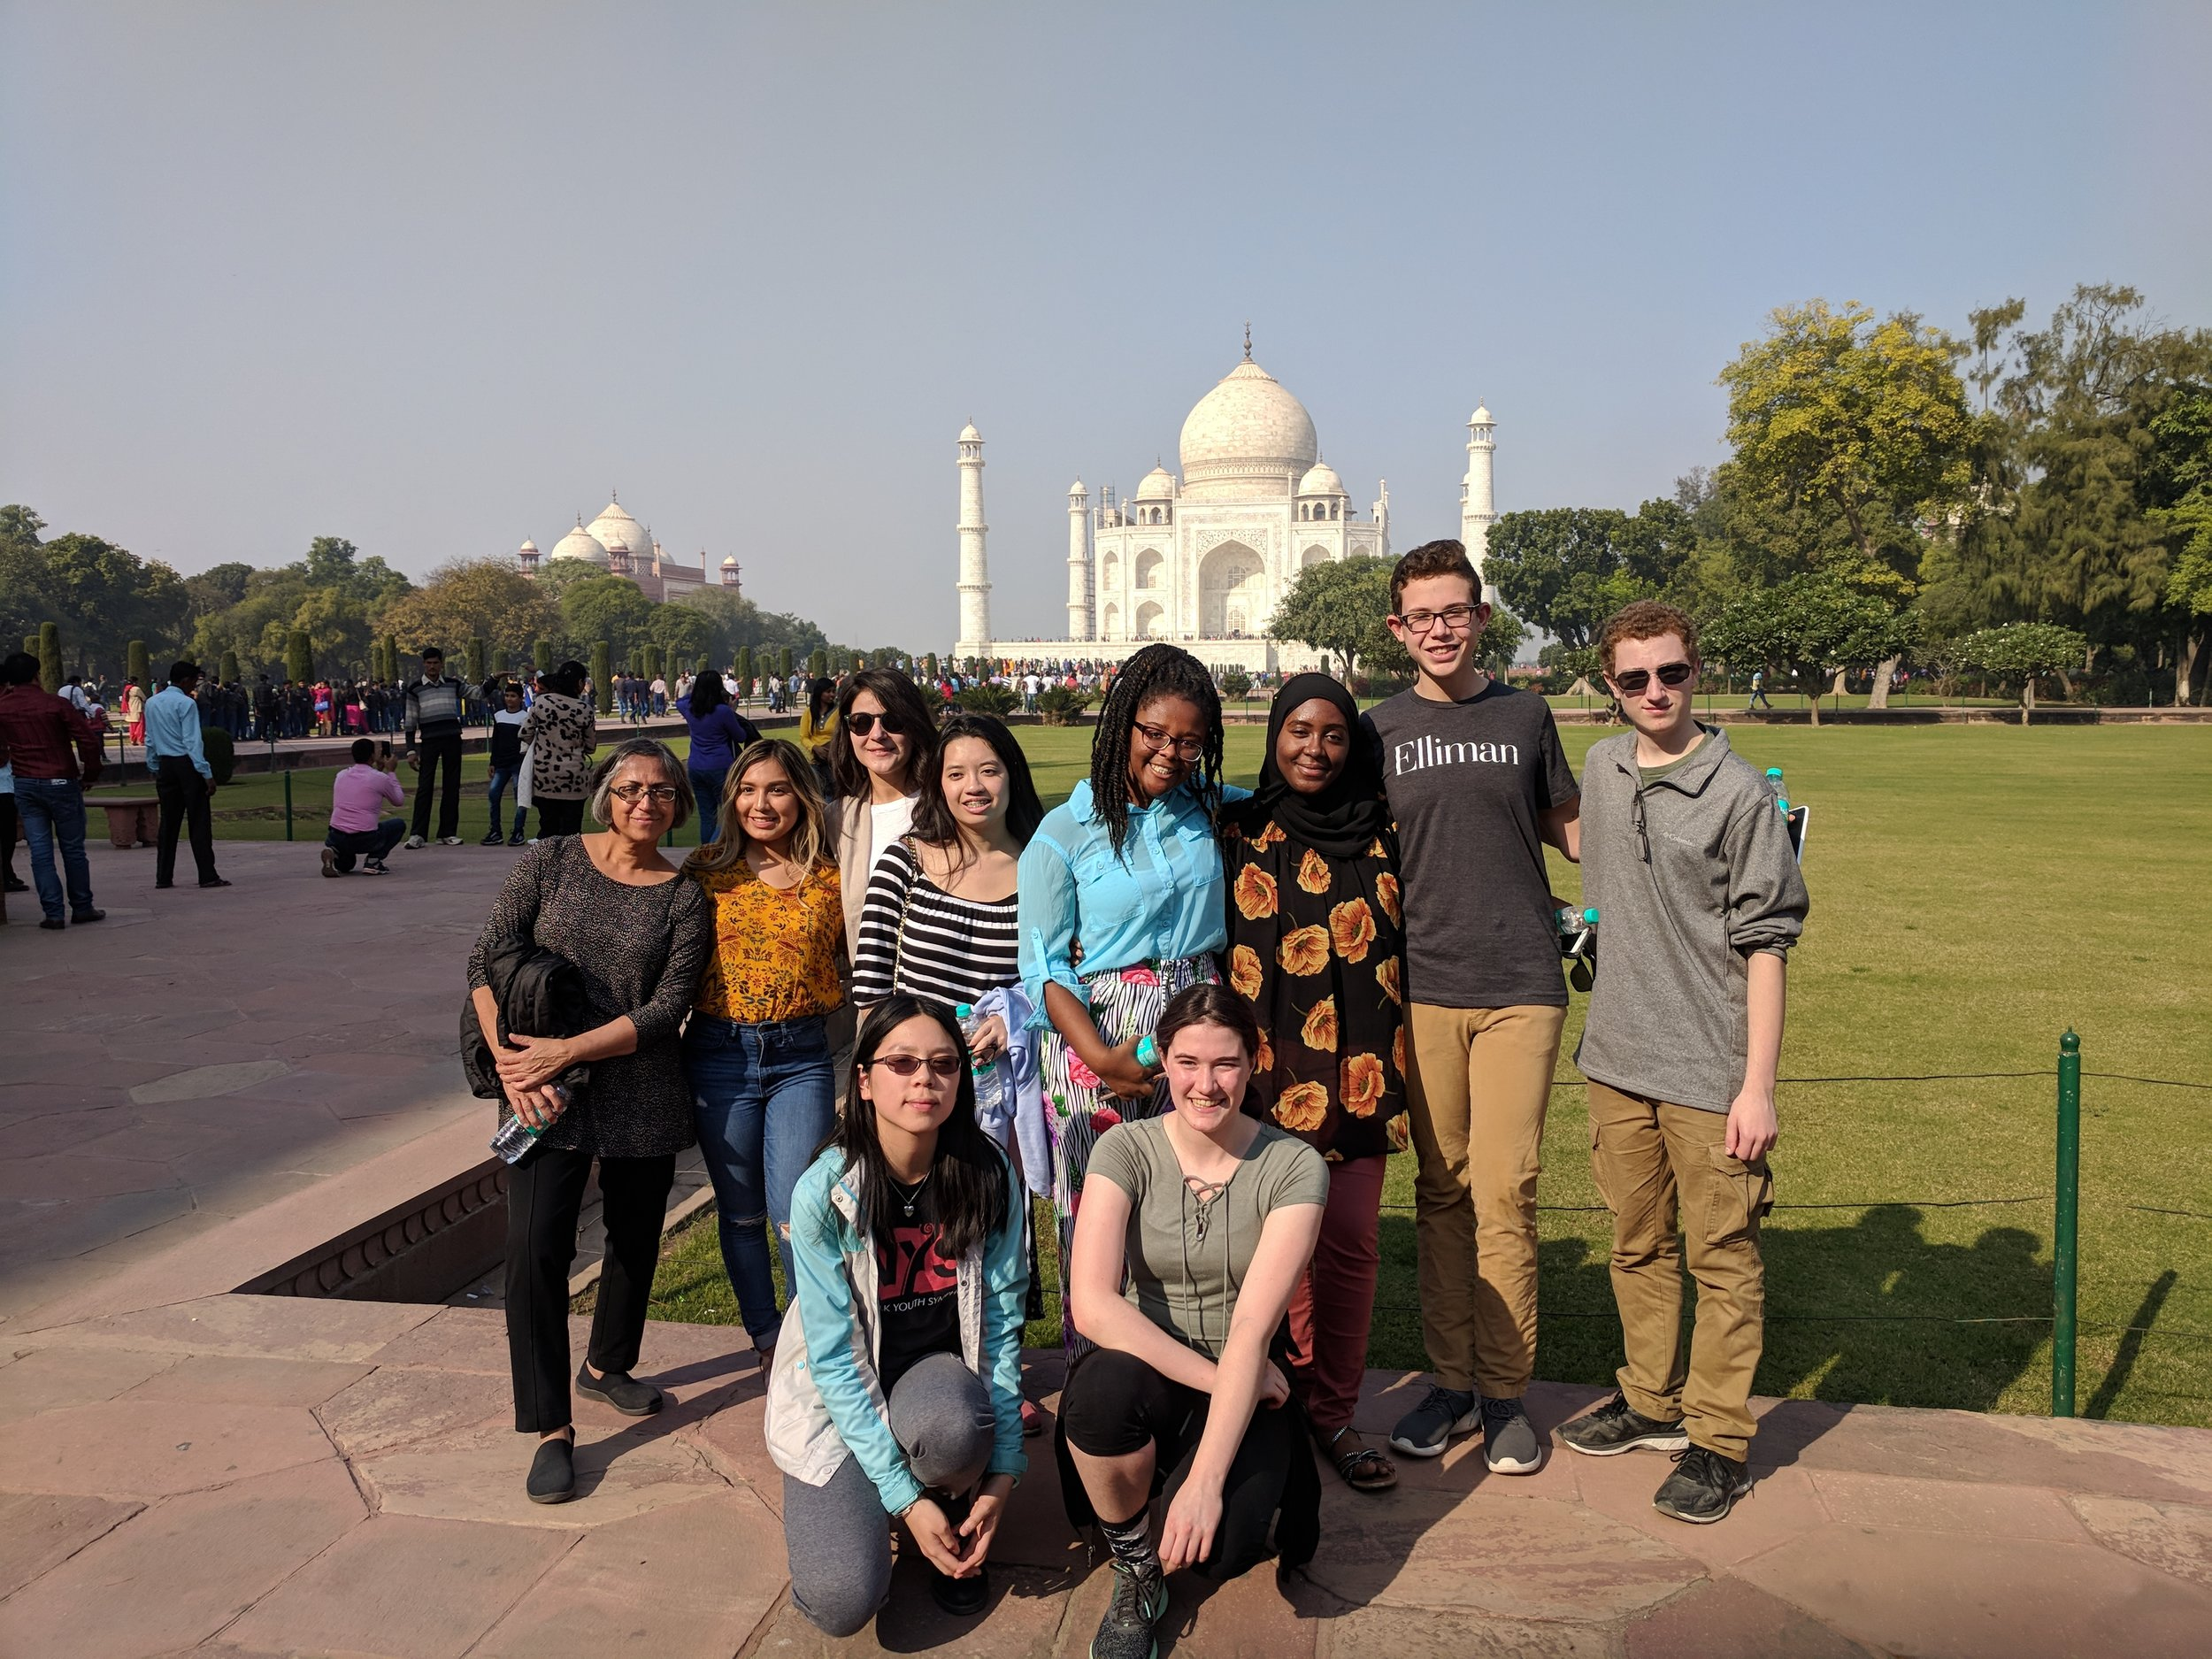 India-Taj-Mahal-School-Group-2017.jpg